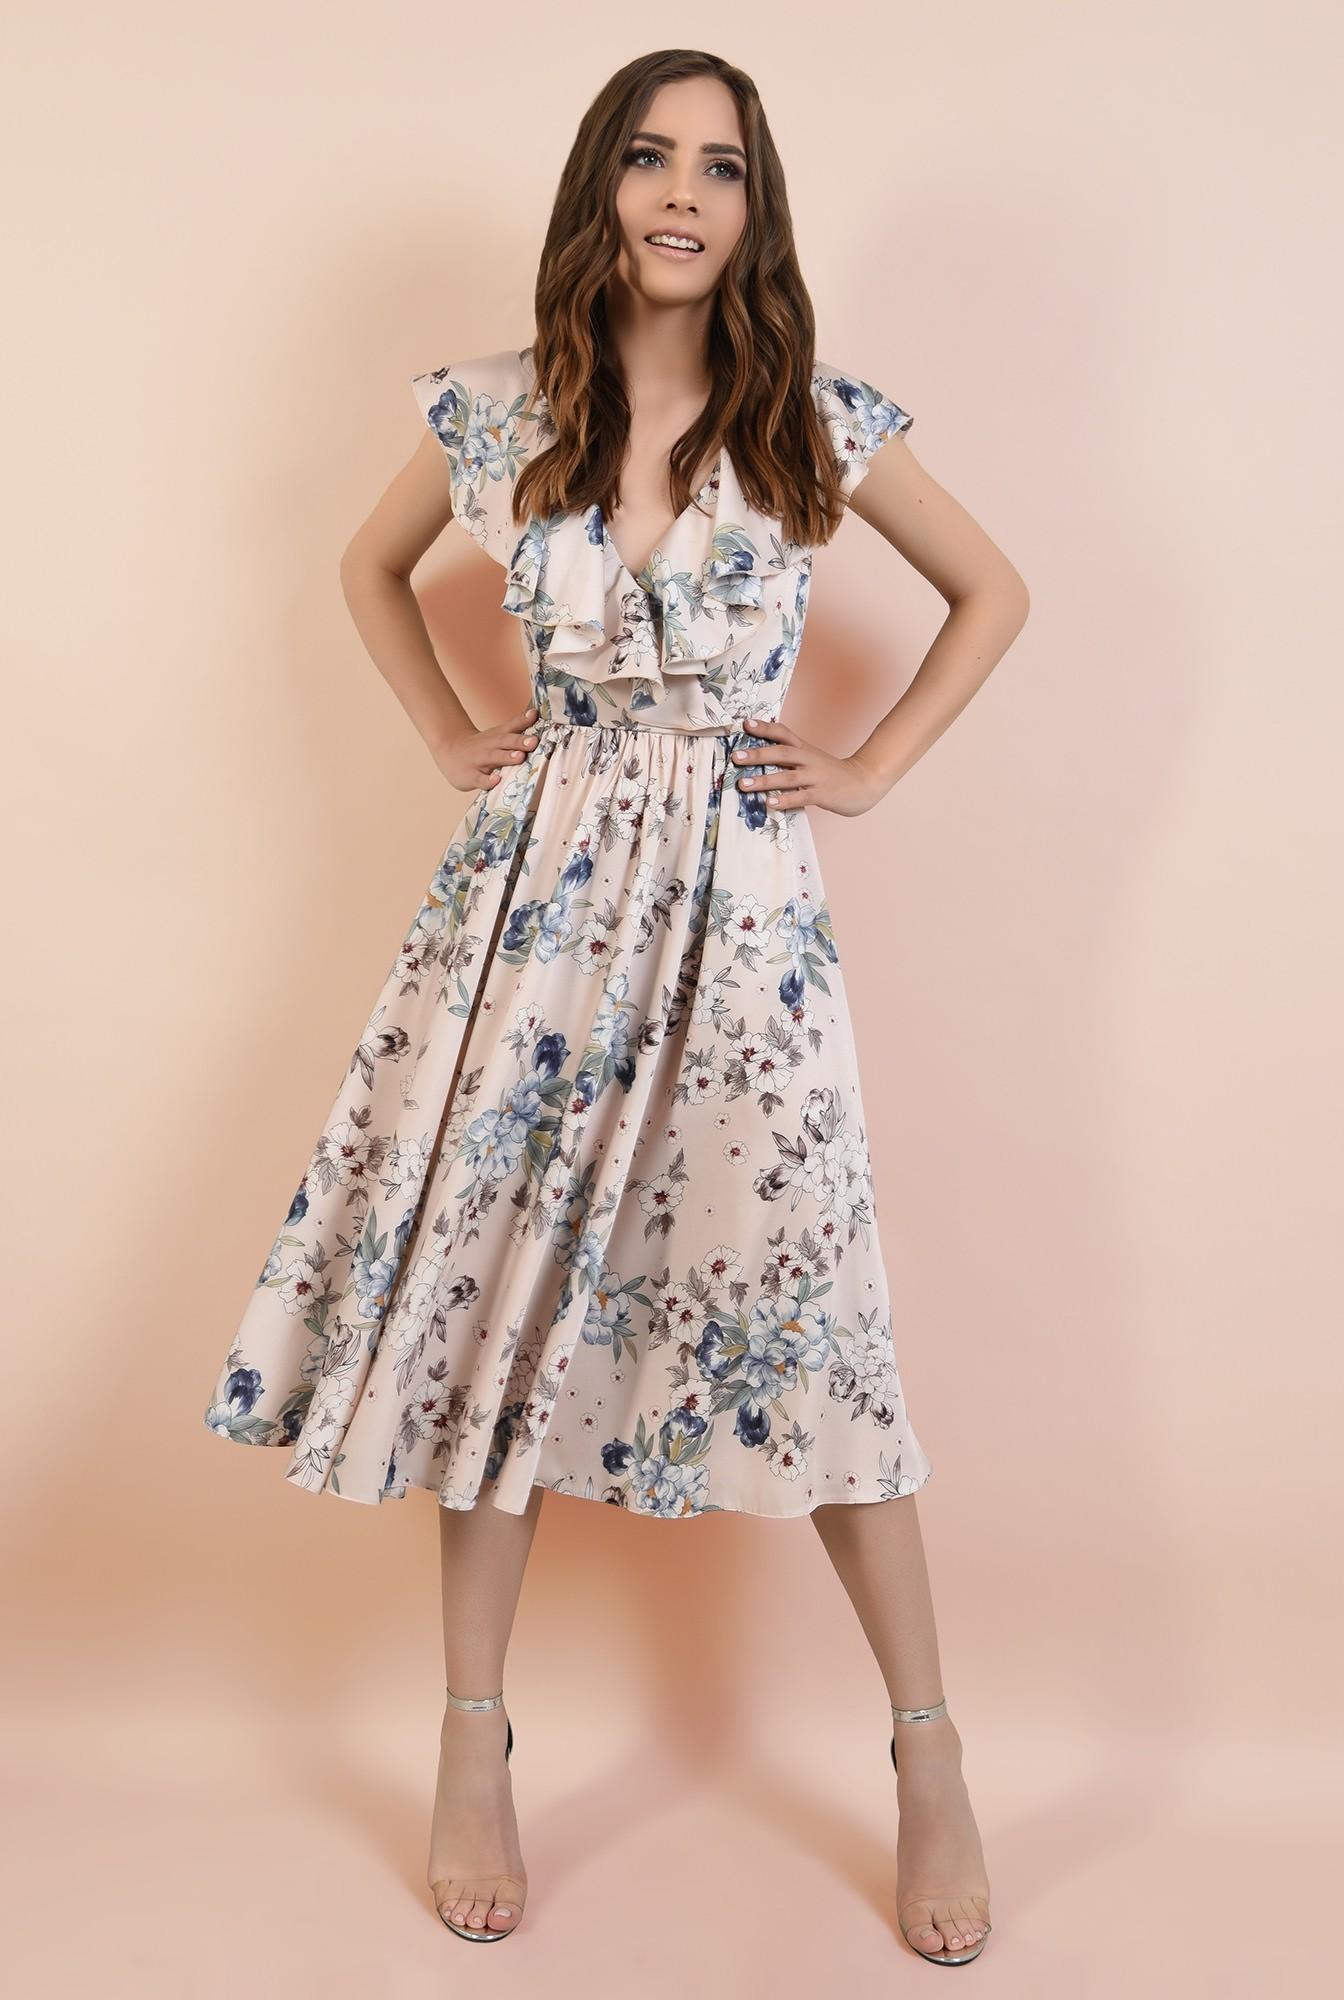 3 - rochie eleganta, evazata, anchior petrecut, maneci volan, imprimata, Poema